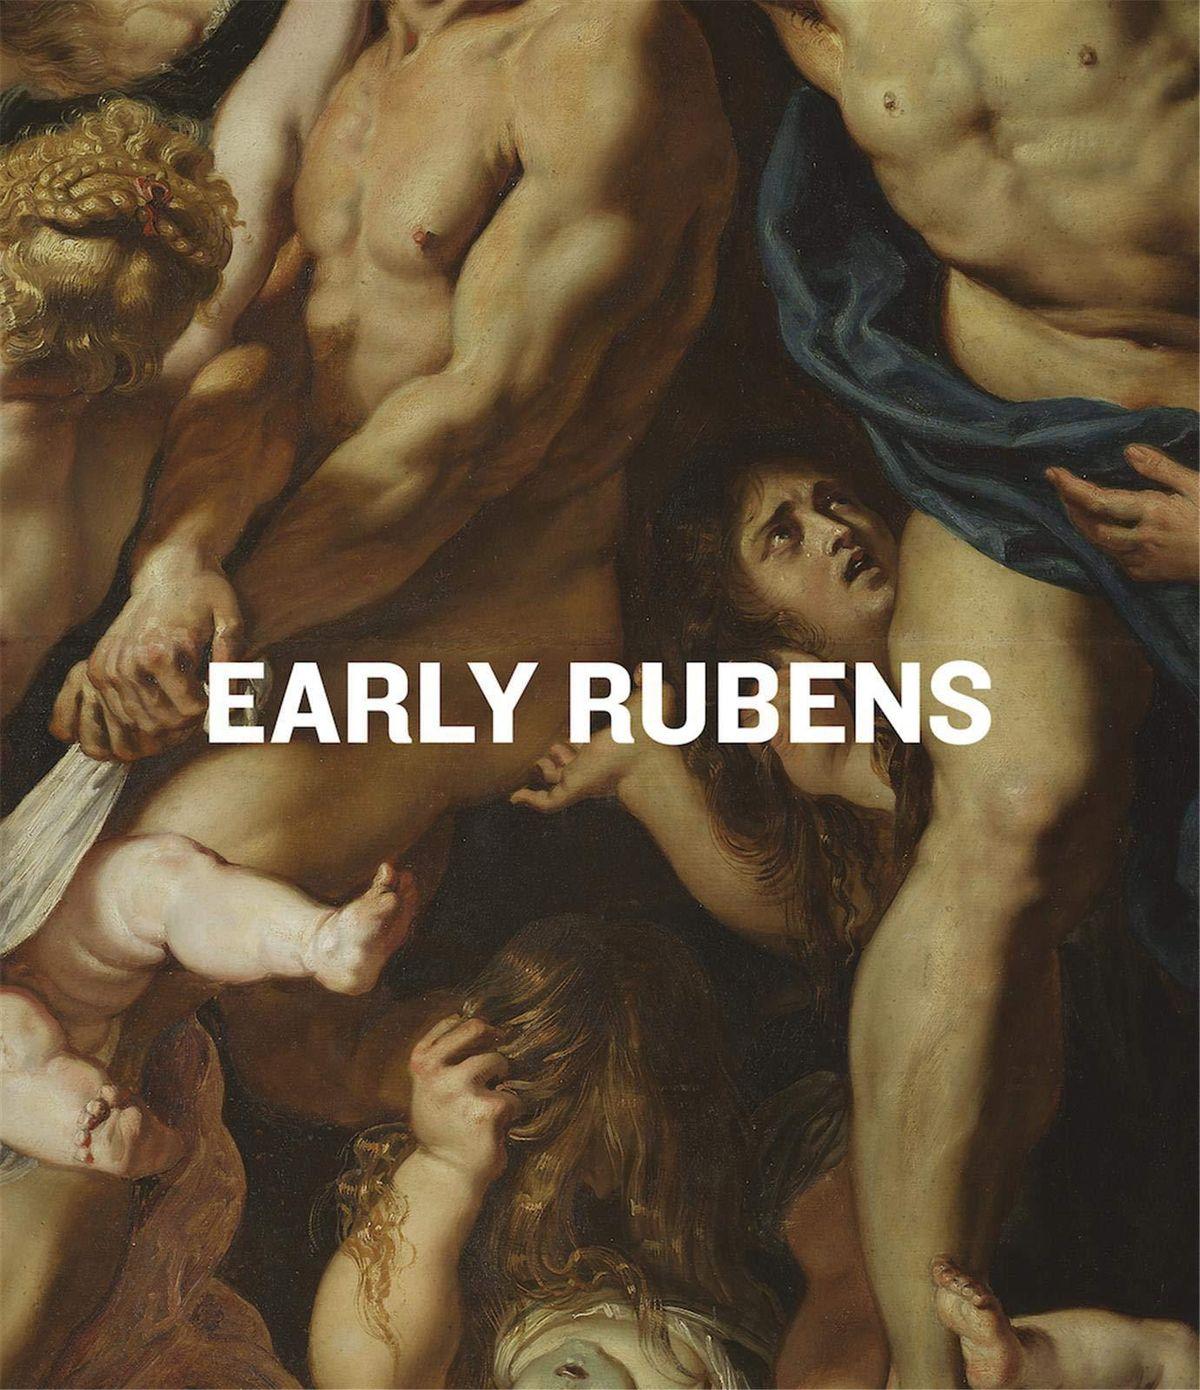 Early Rubens